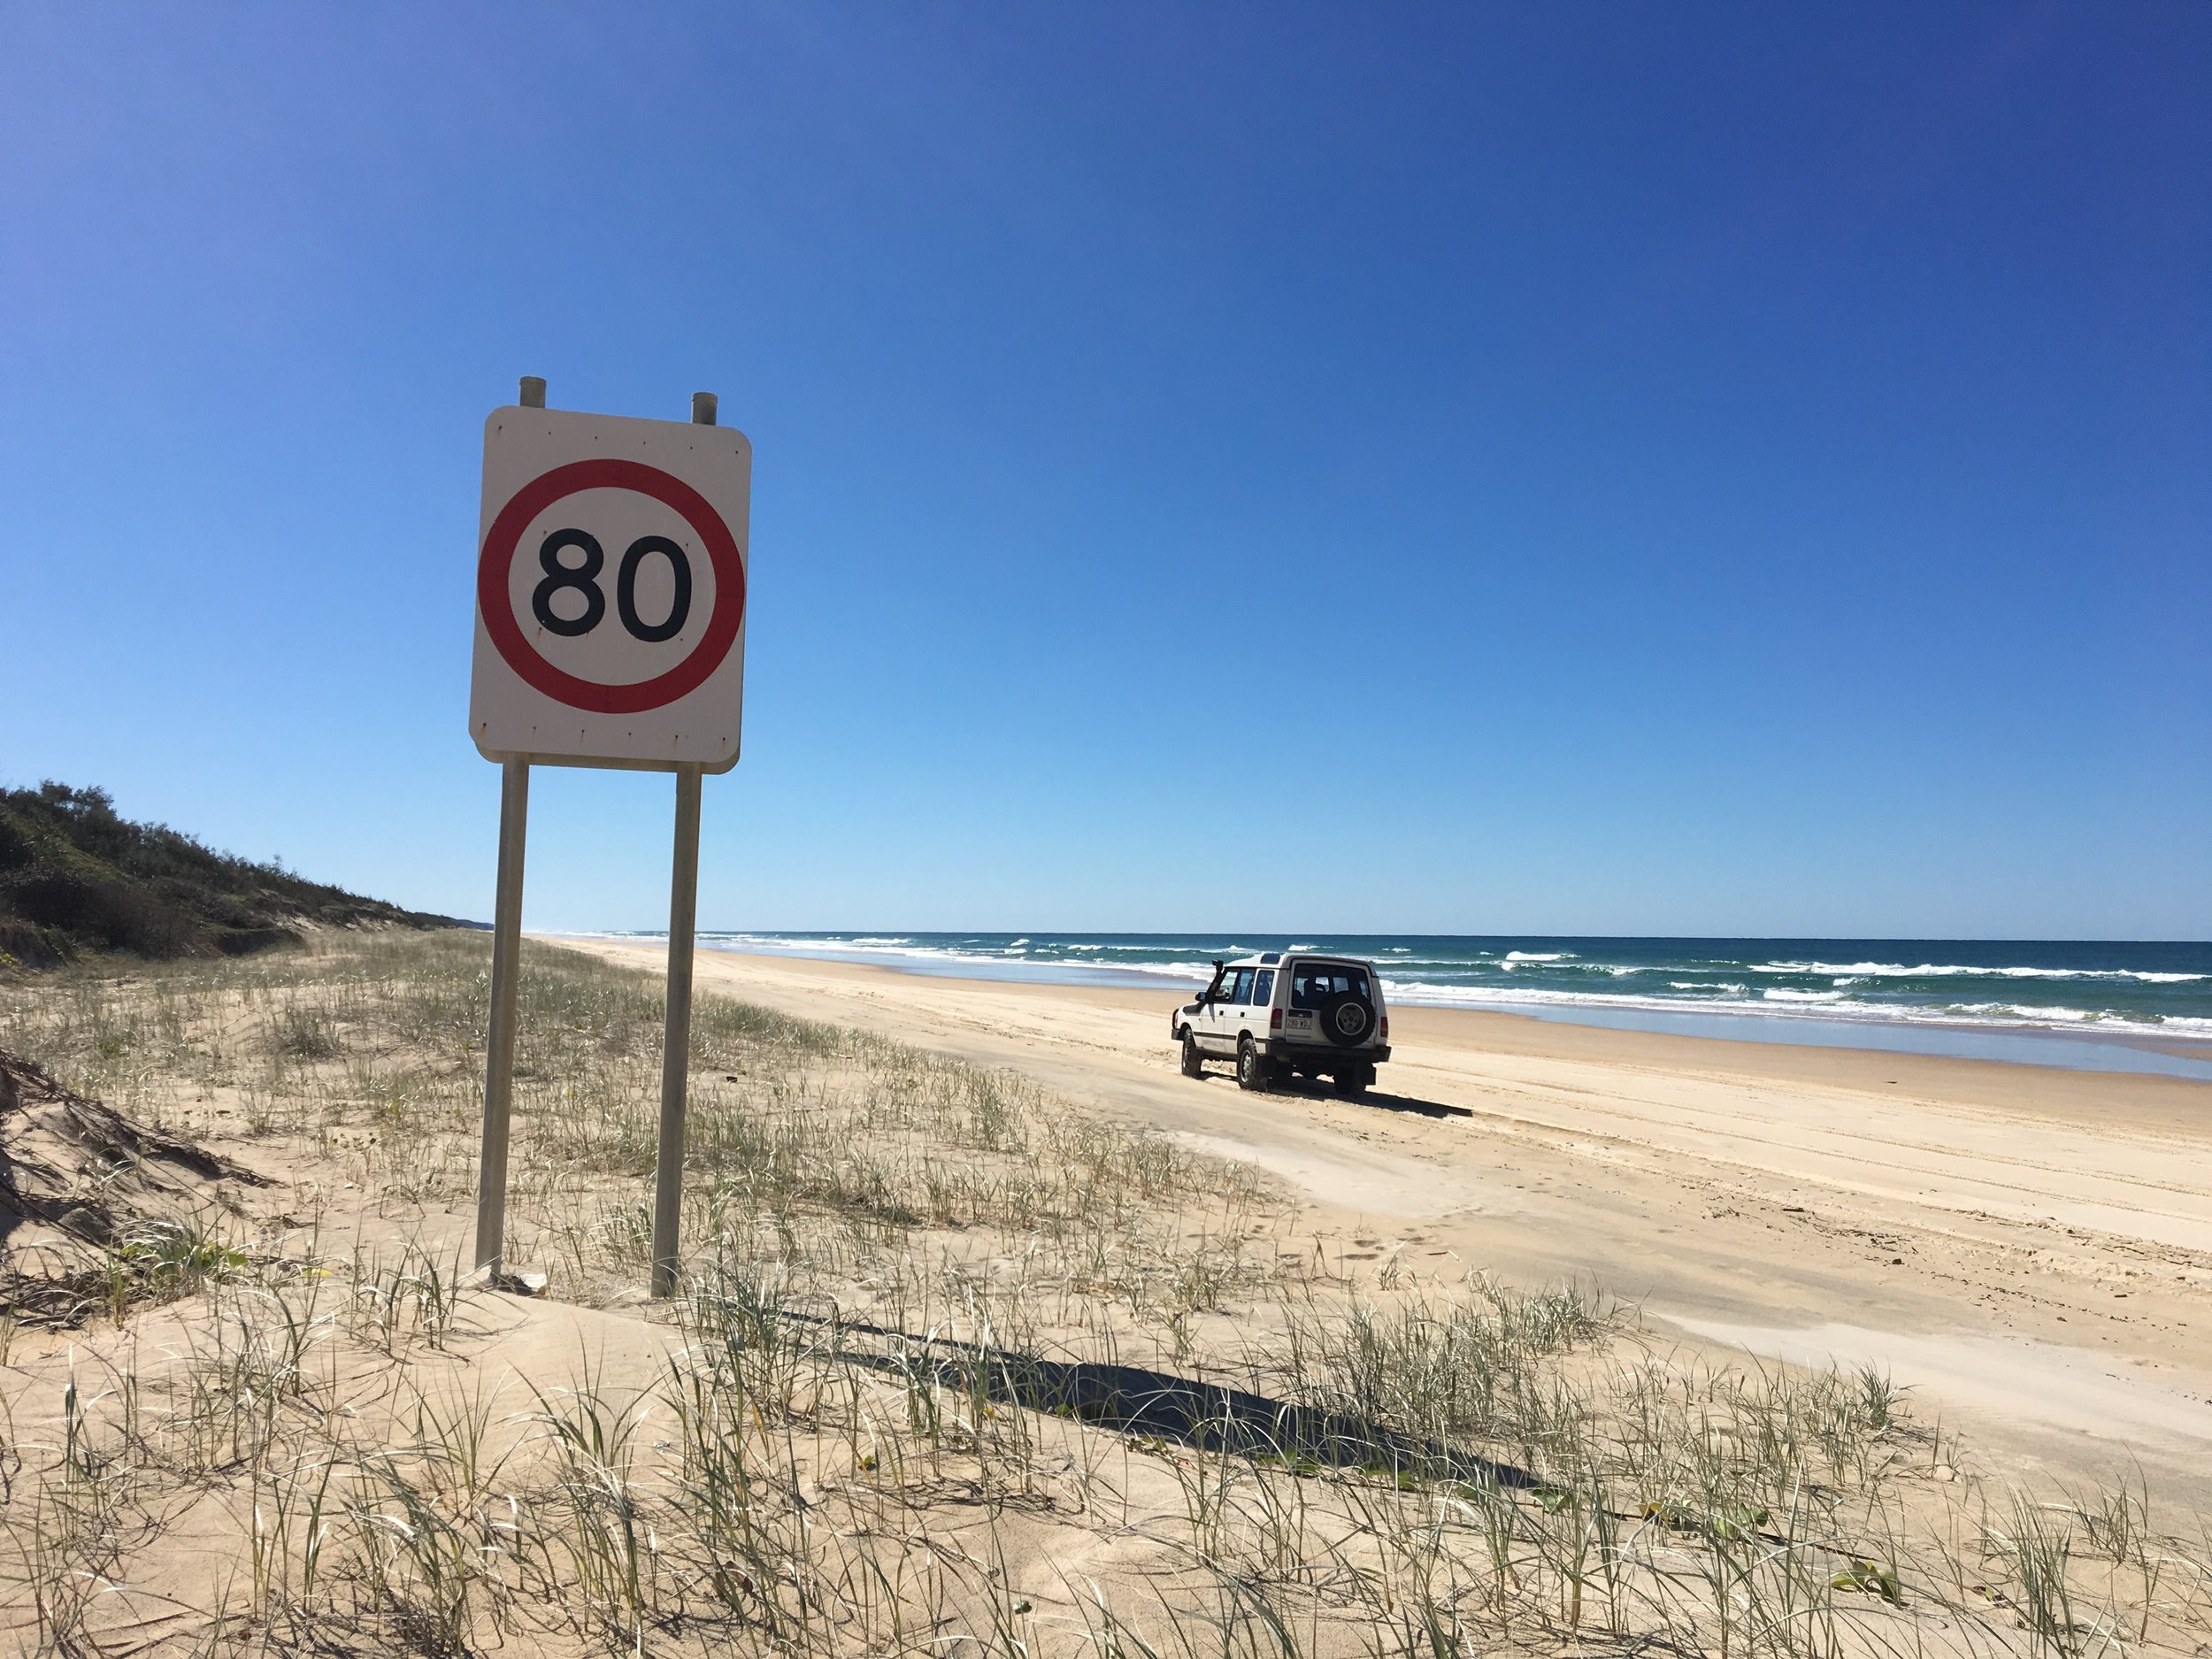 Fahren am Strand